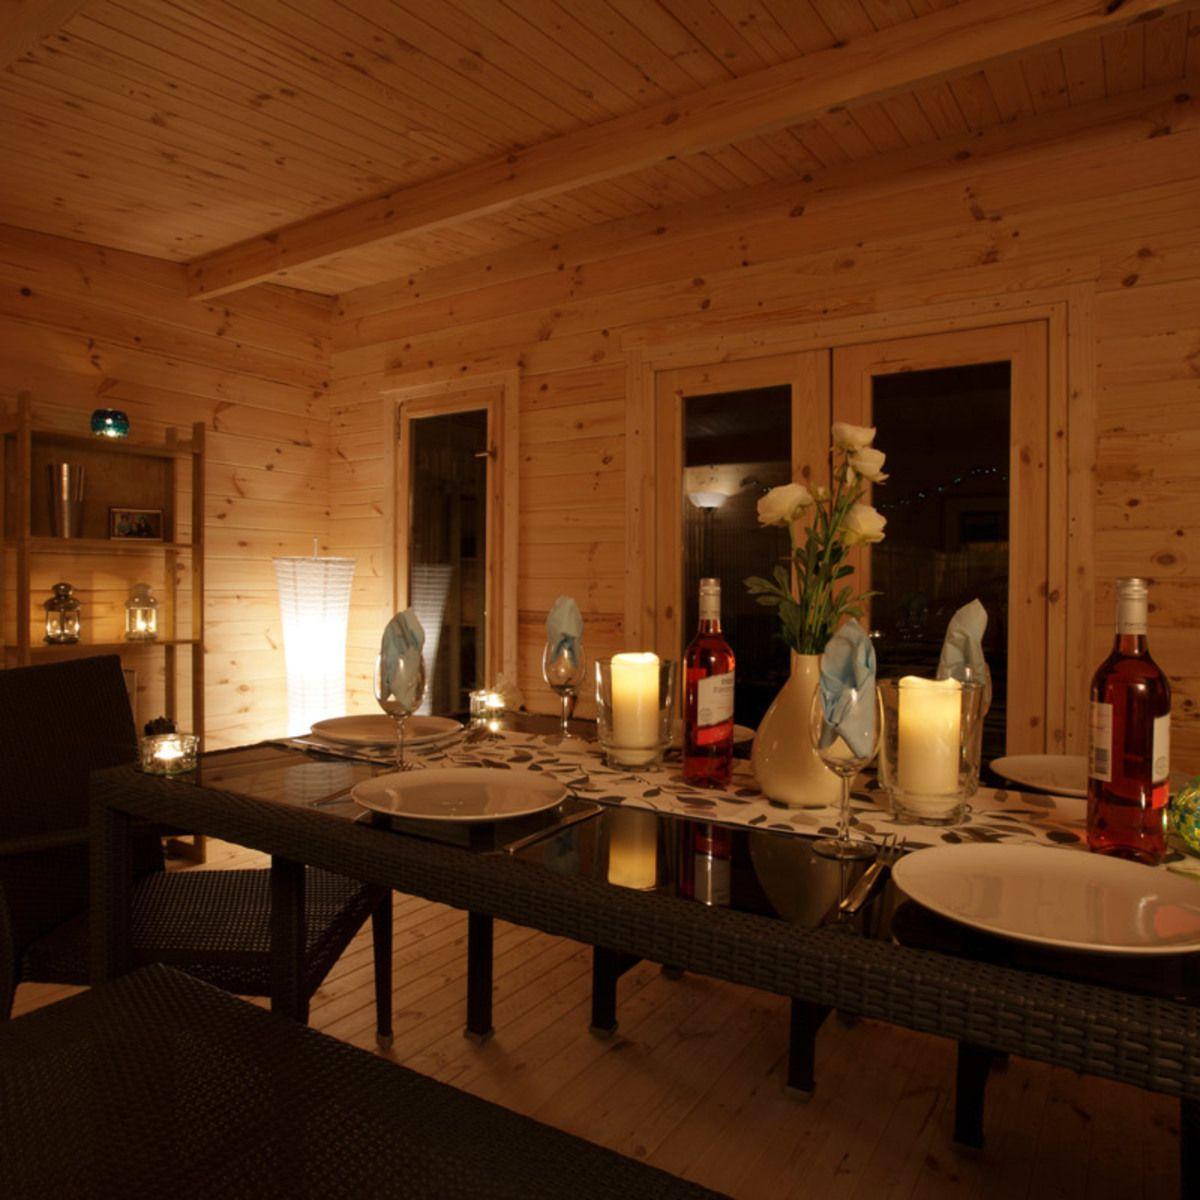 Installed Forest Garden Mendip 44mm Log Cabin 17ft X 13ft 1 5 2 X 4 0 M Costco Uk In 2020 Log Cabin Cabin Interior Lighting